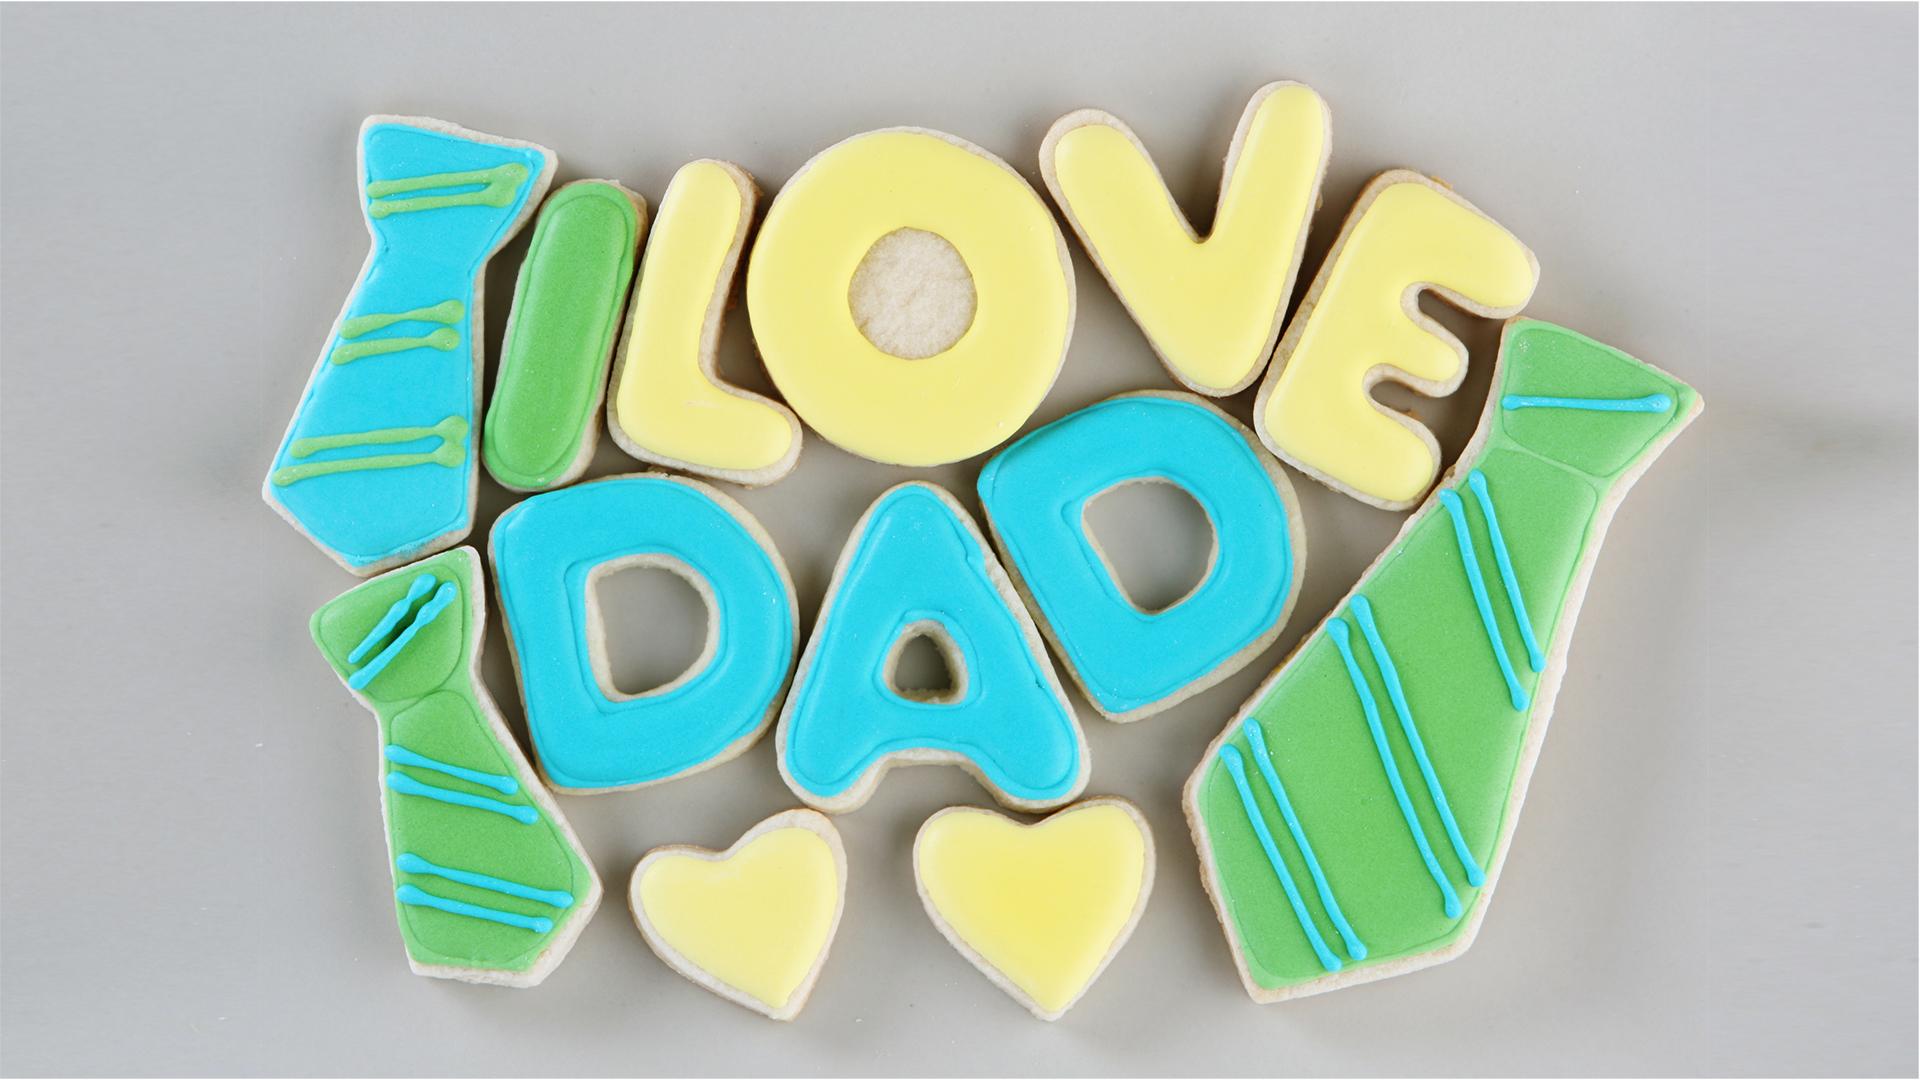 Promo_BakeSale_FathersDay.jpg